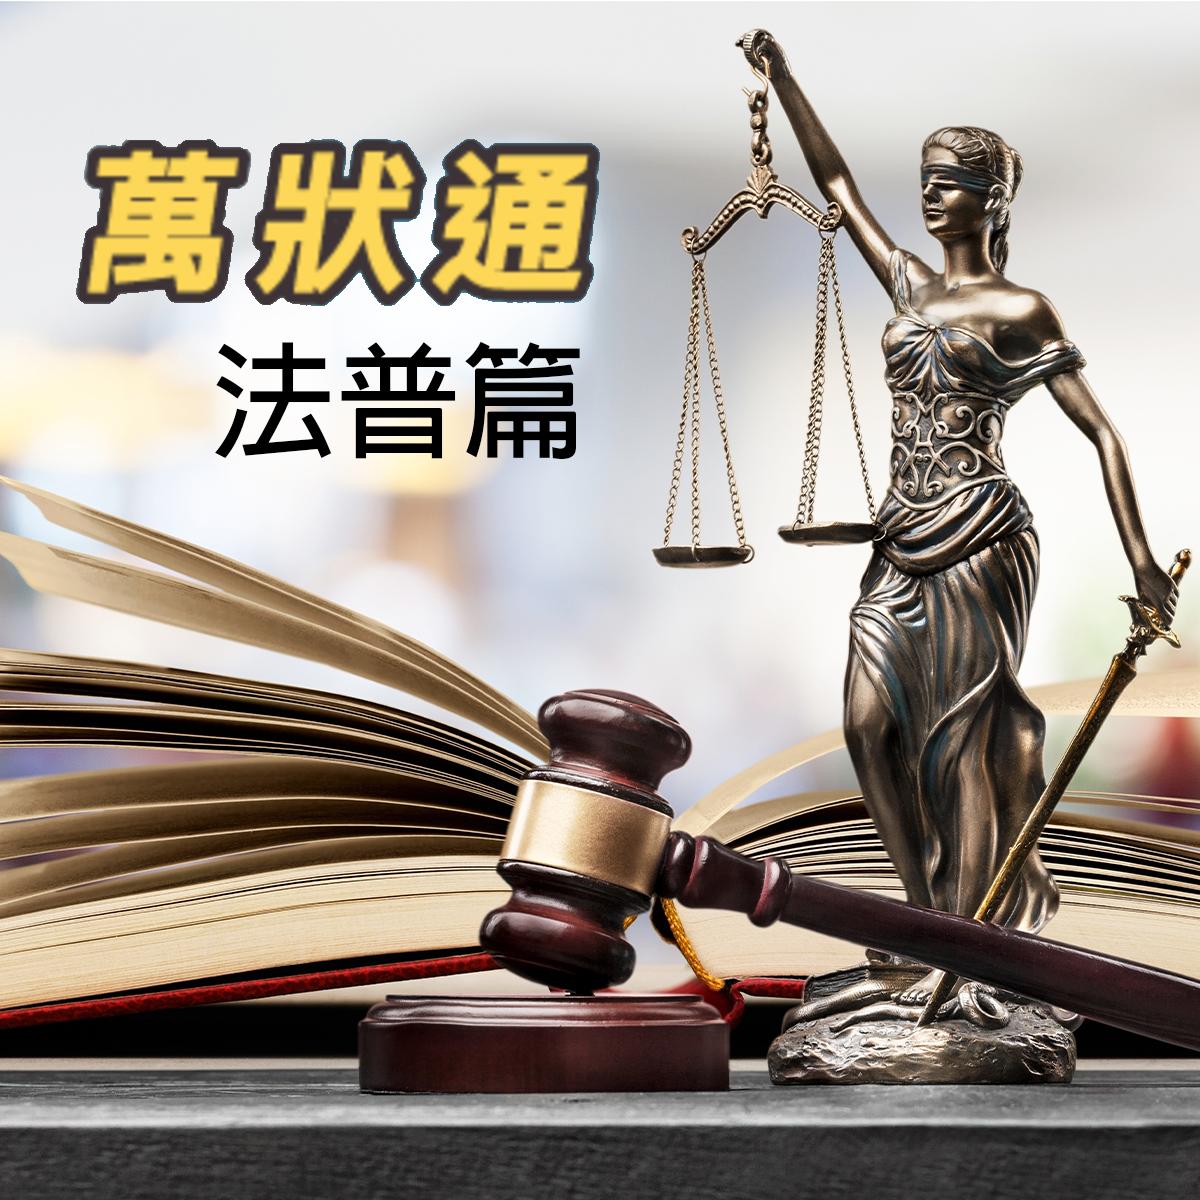 EP9【雷公尛 ⚖️ 法律】宅配退貨法規、超取時被要求提供證件違反個資法嗎?